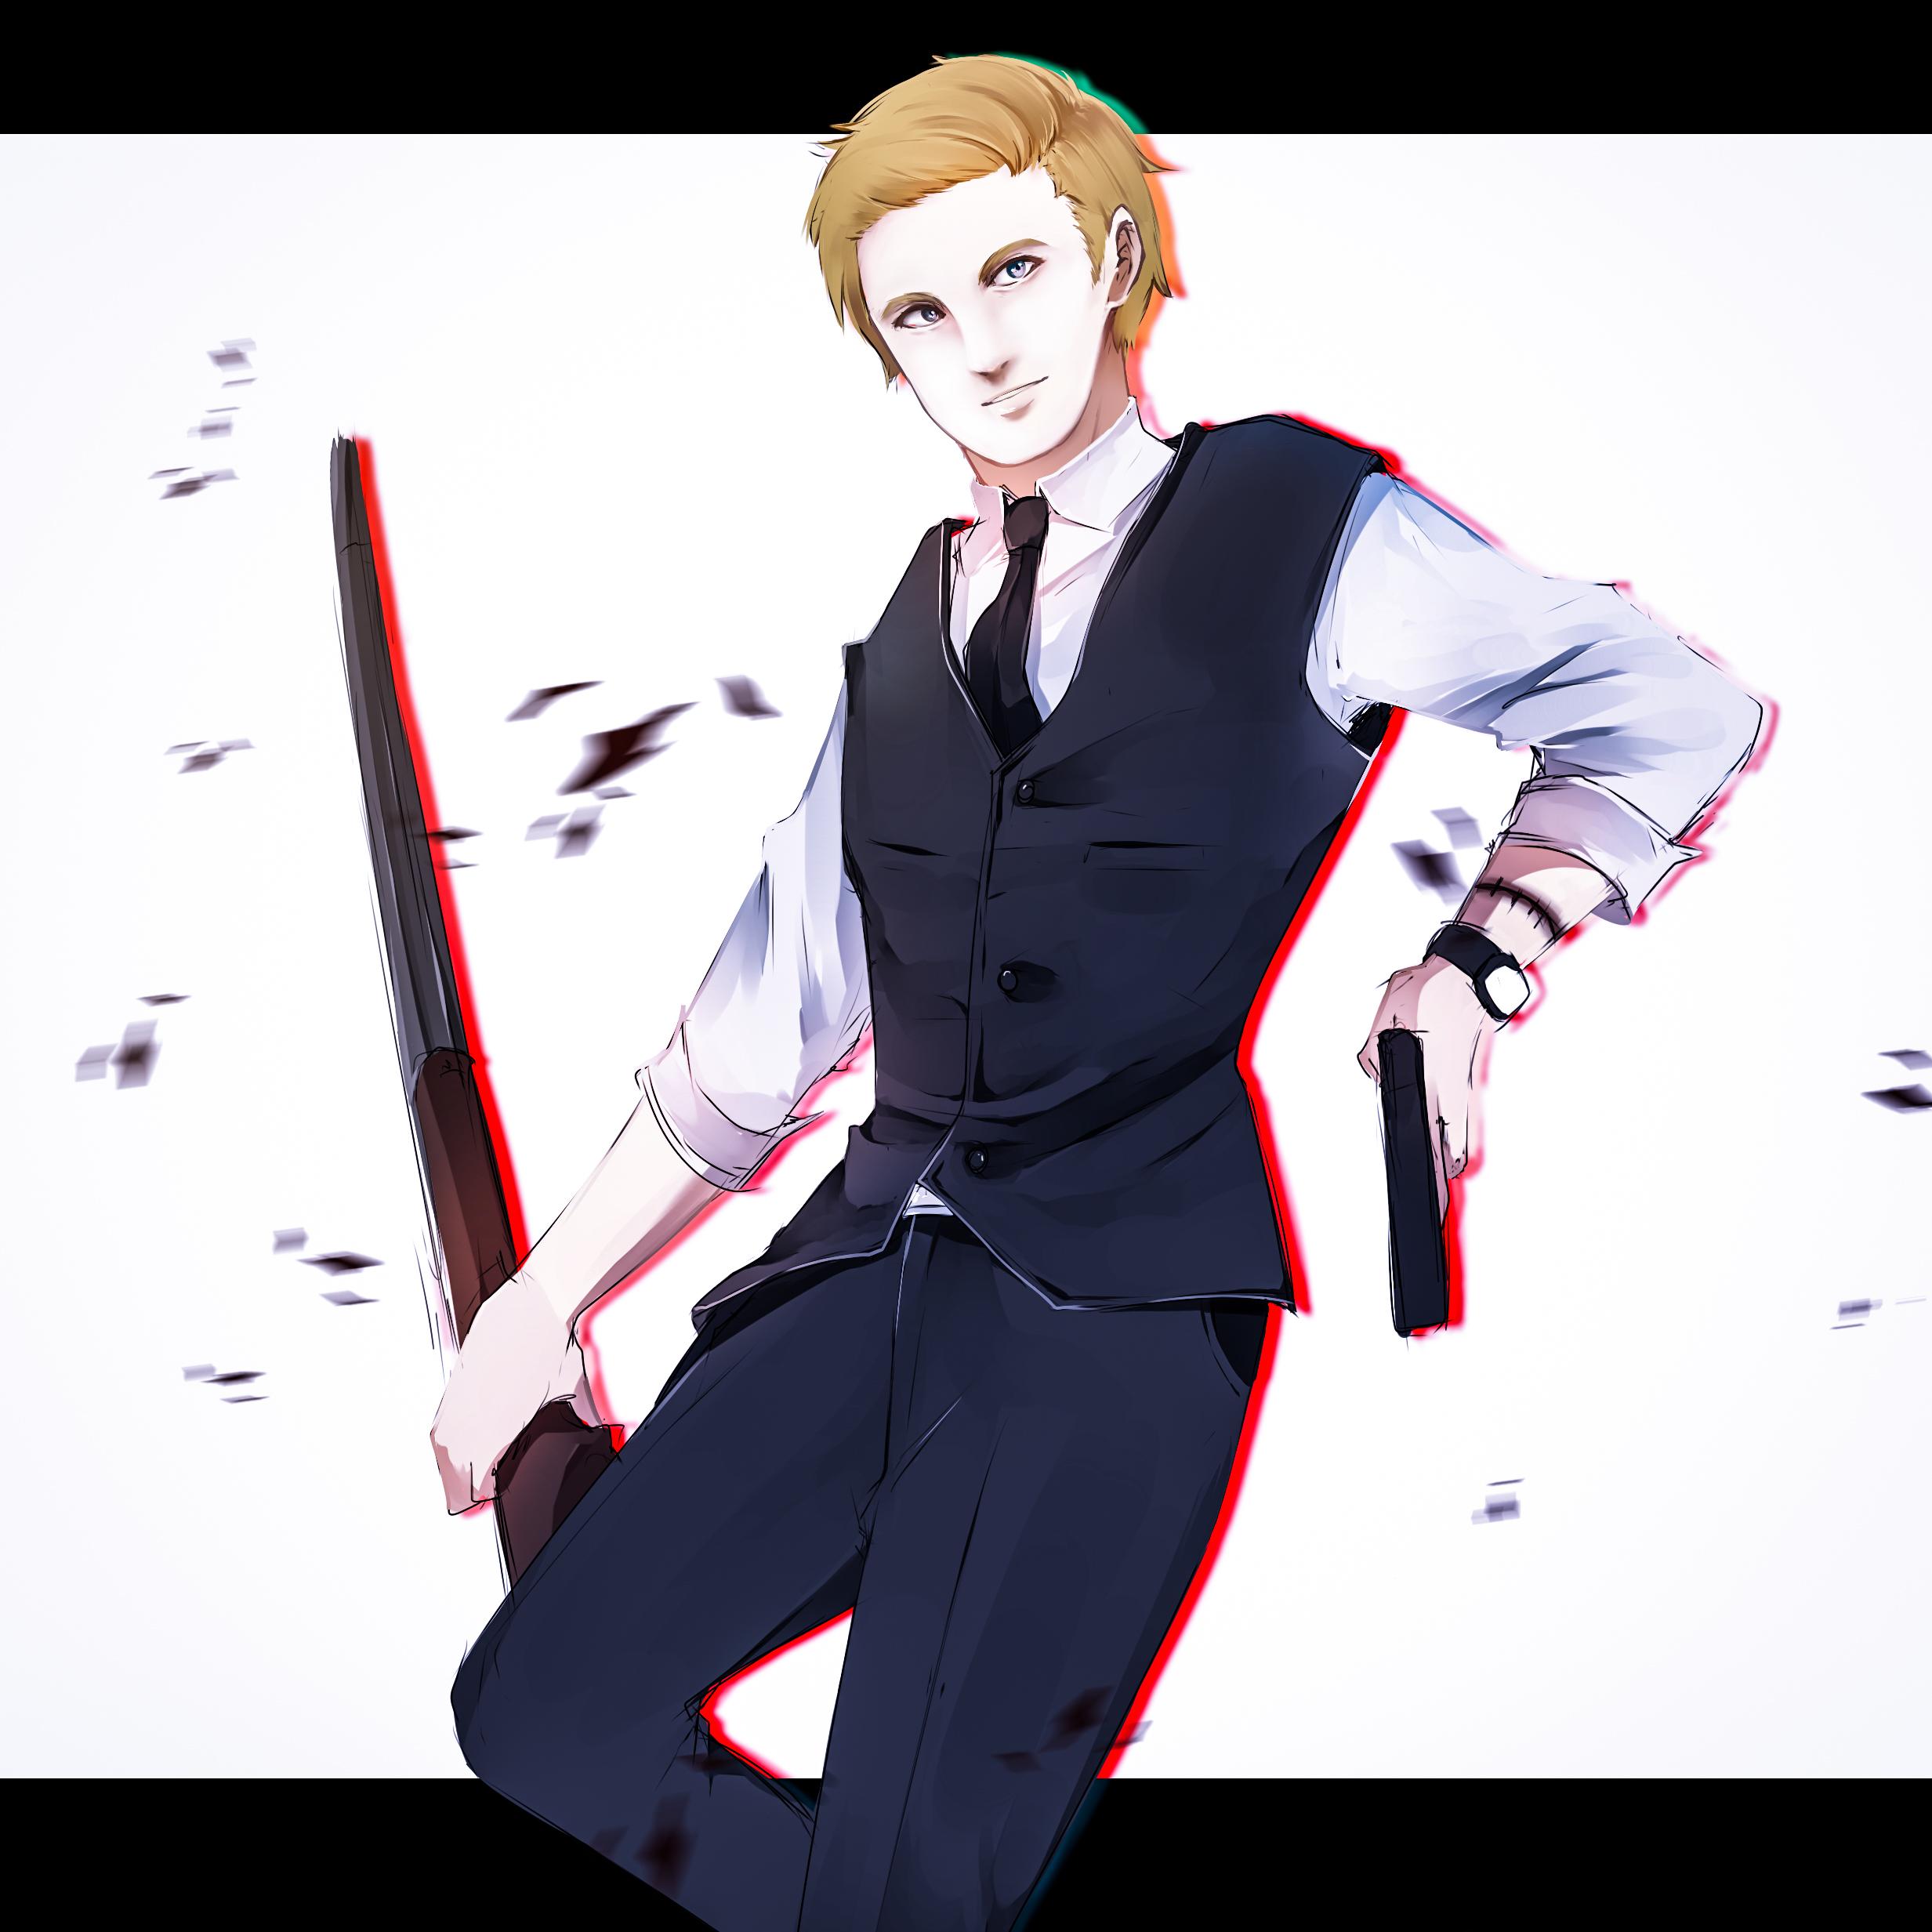 Ethan Winters Resident Evil 7 Biohazard Image 2227590